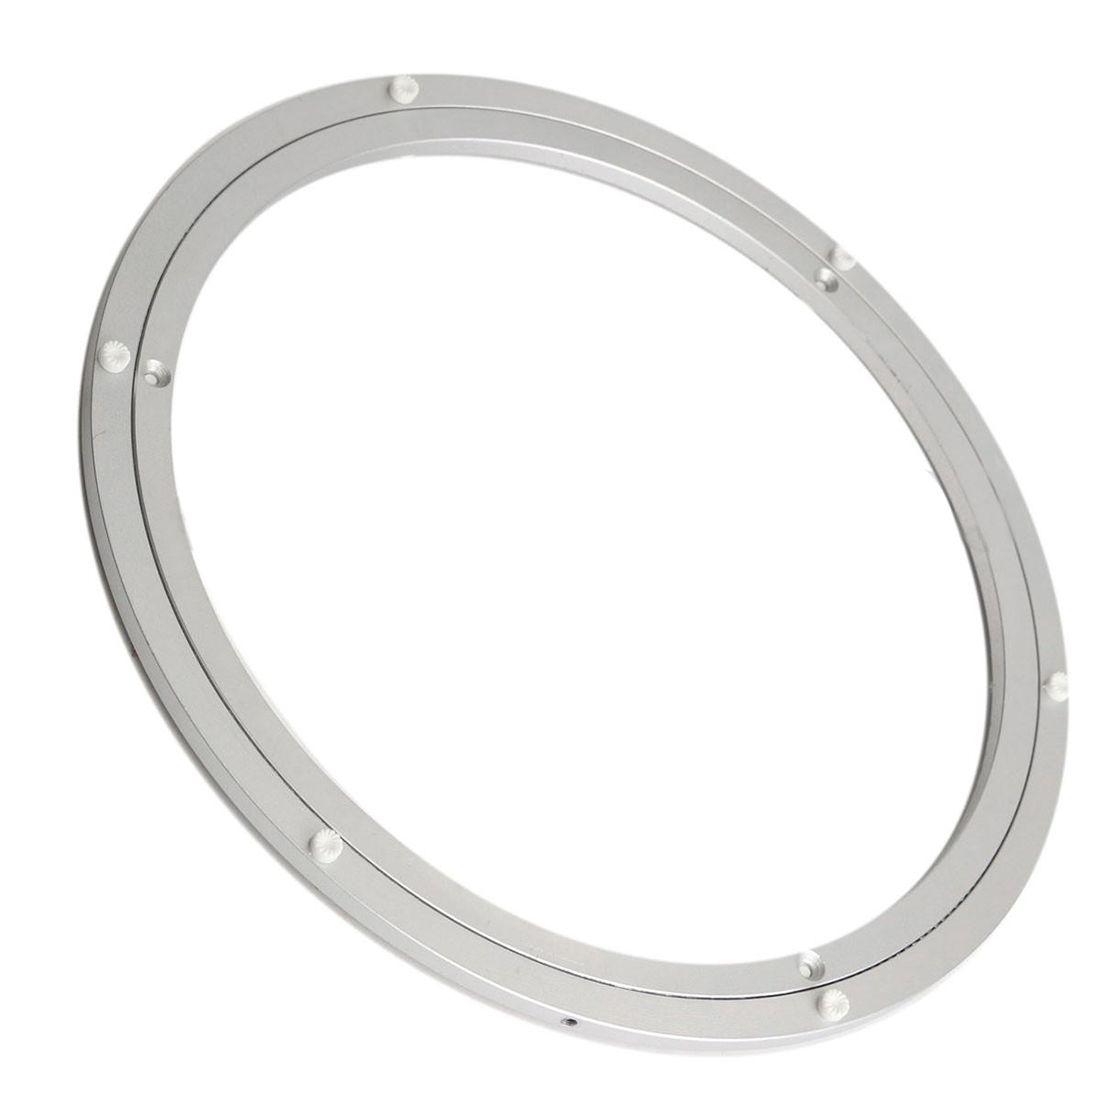 Aluminium Rotating Turntable Bearing Swivel Plate 16 Inch Silver